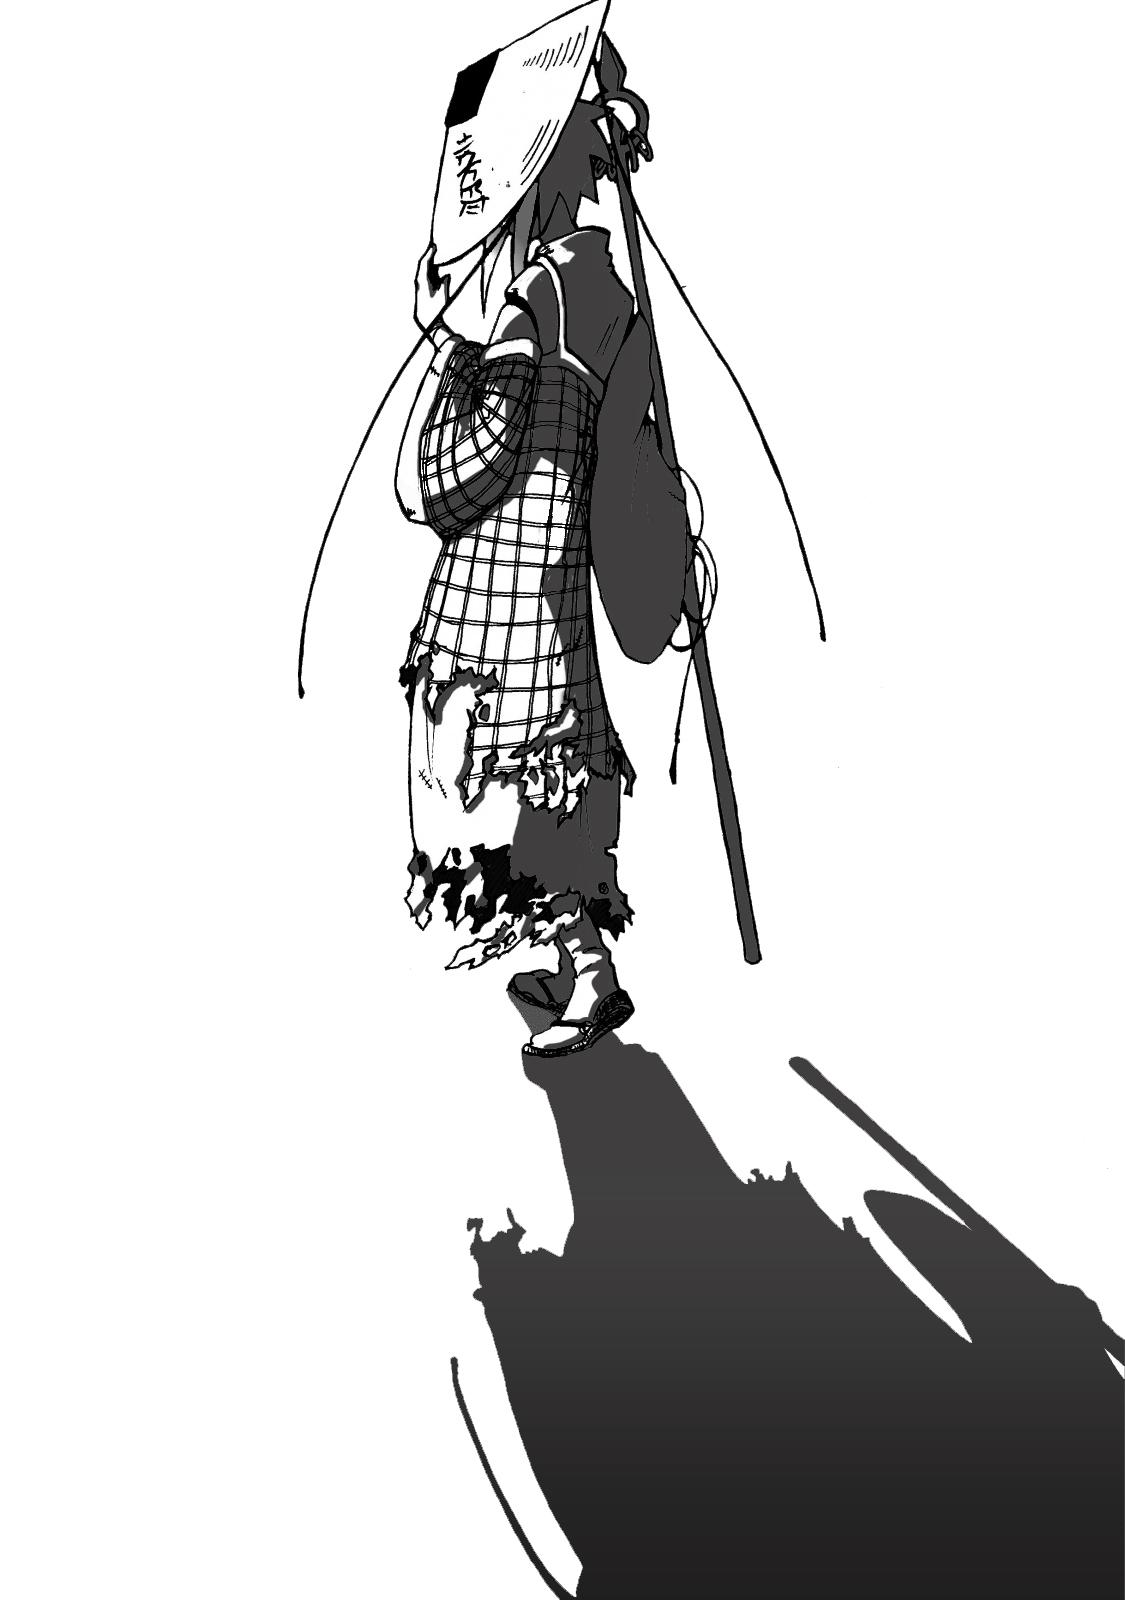 The lonesome warrior by cybersuzy